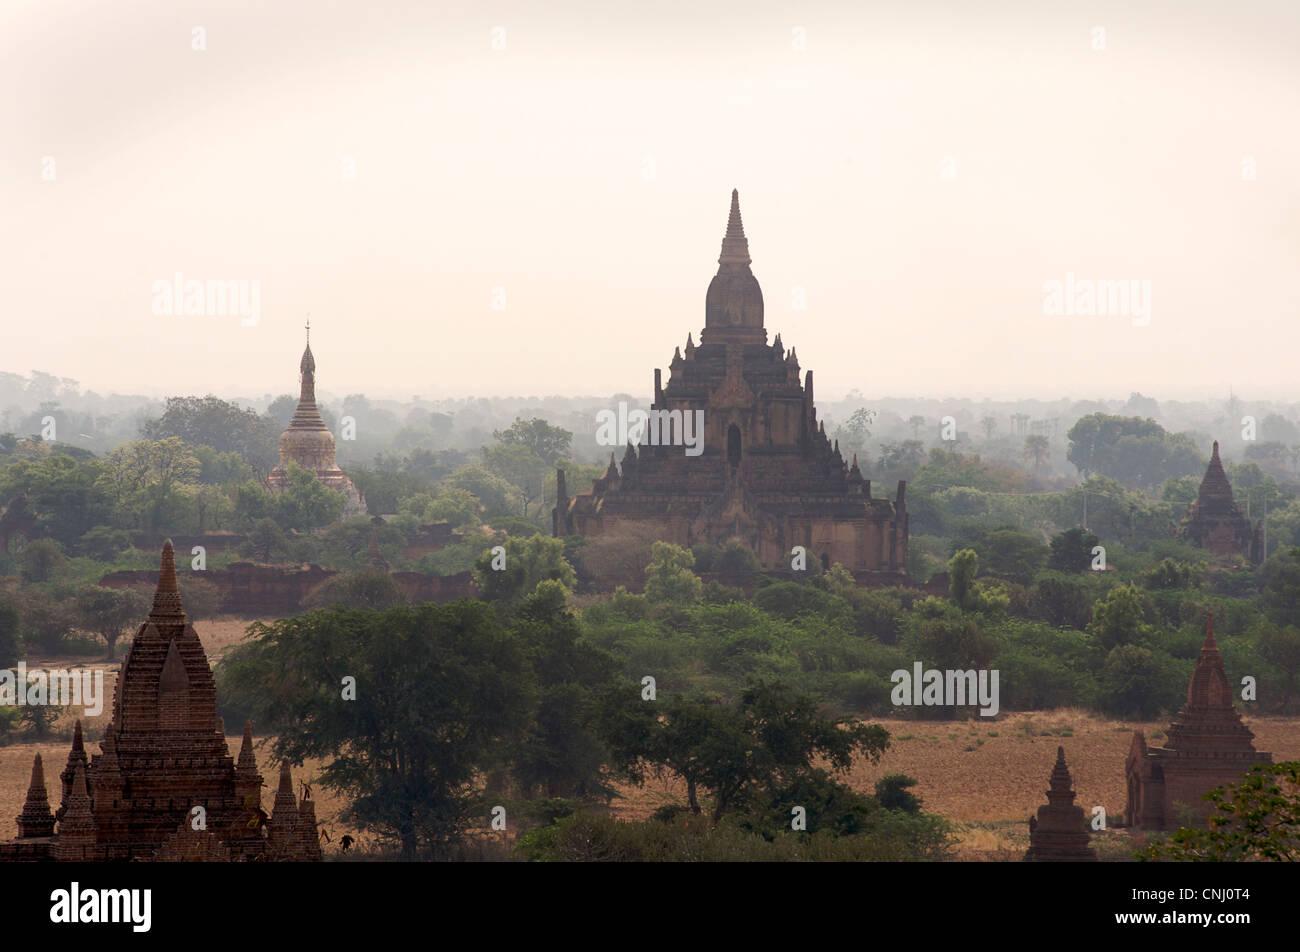 View across the Plains of Pagan from Dhammayazika paya. Burma. Bagan, Myanmar - Stock Image